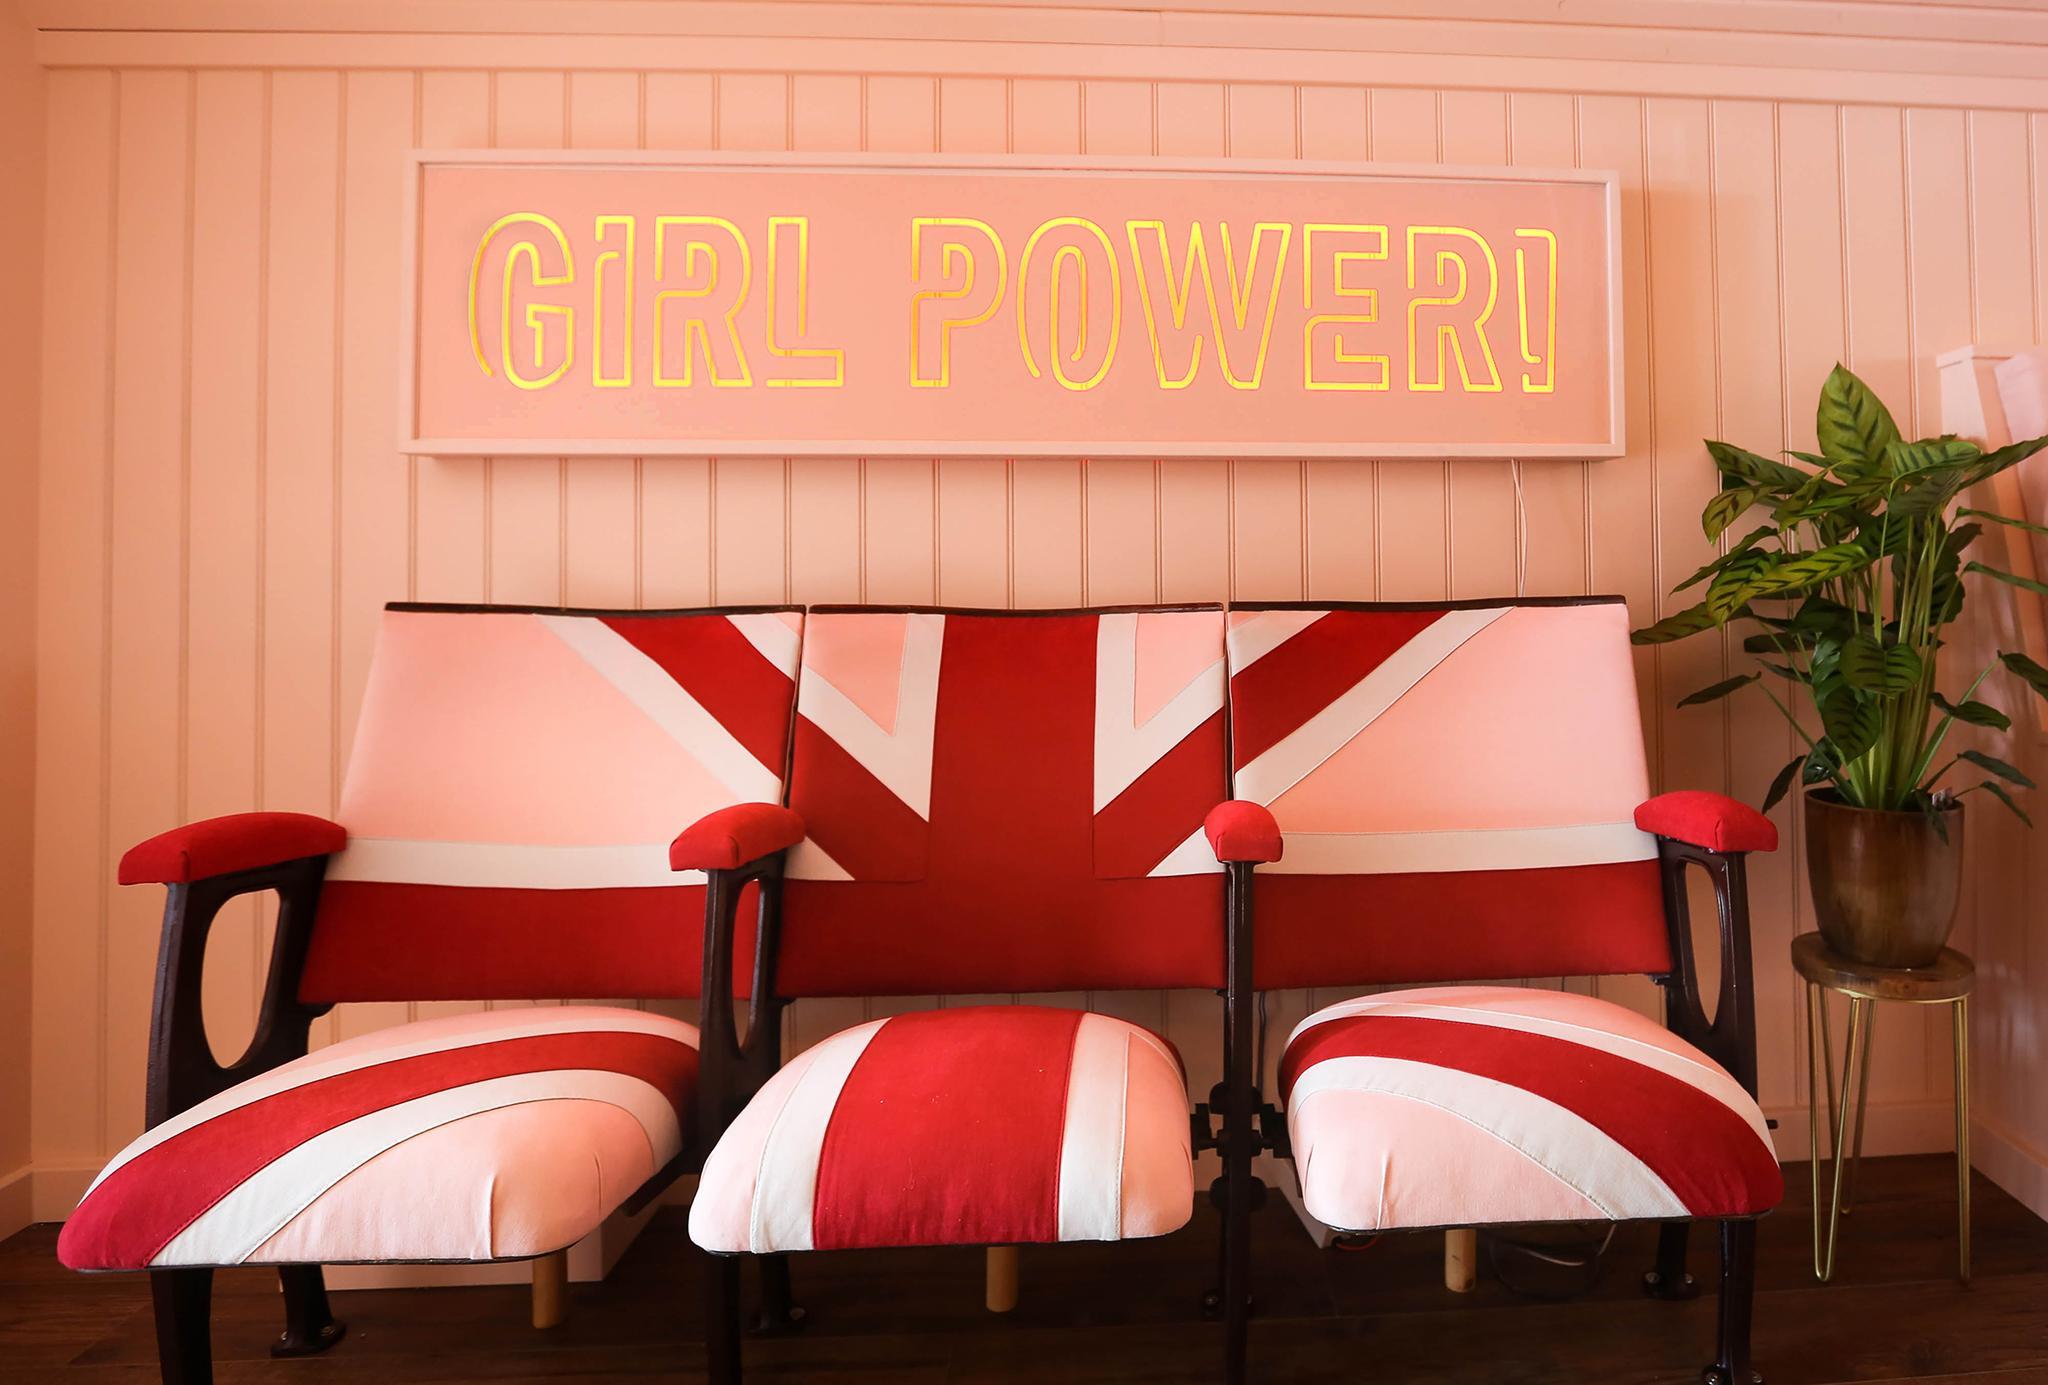 How to spot hidden cameras in Airbnb rental properties | The